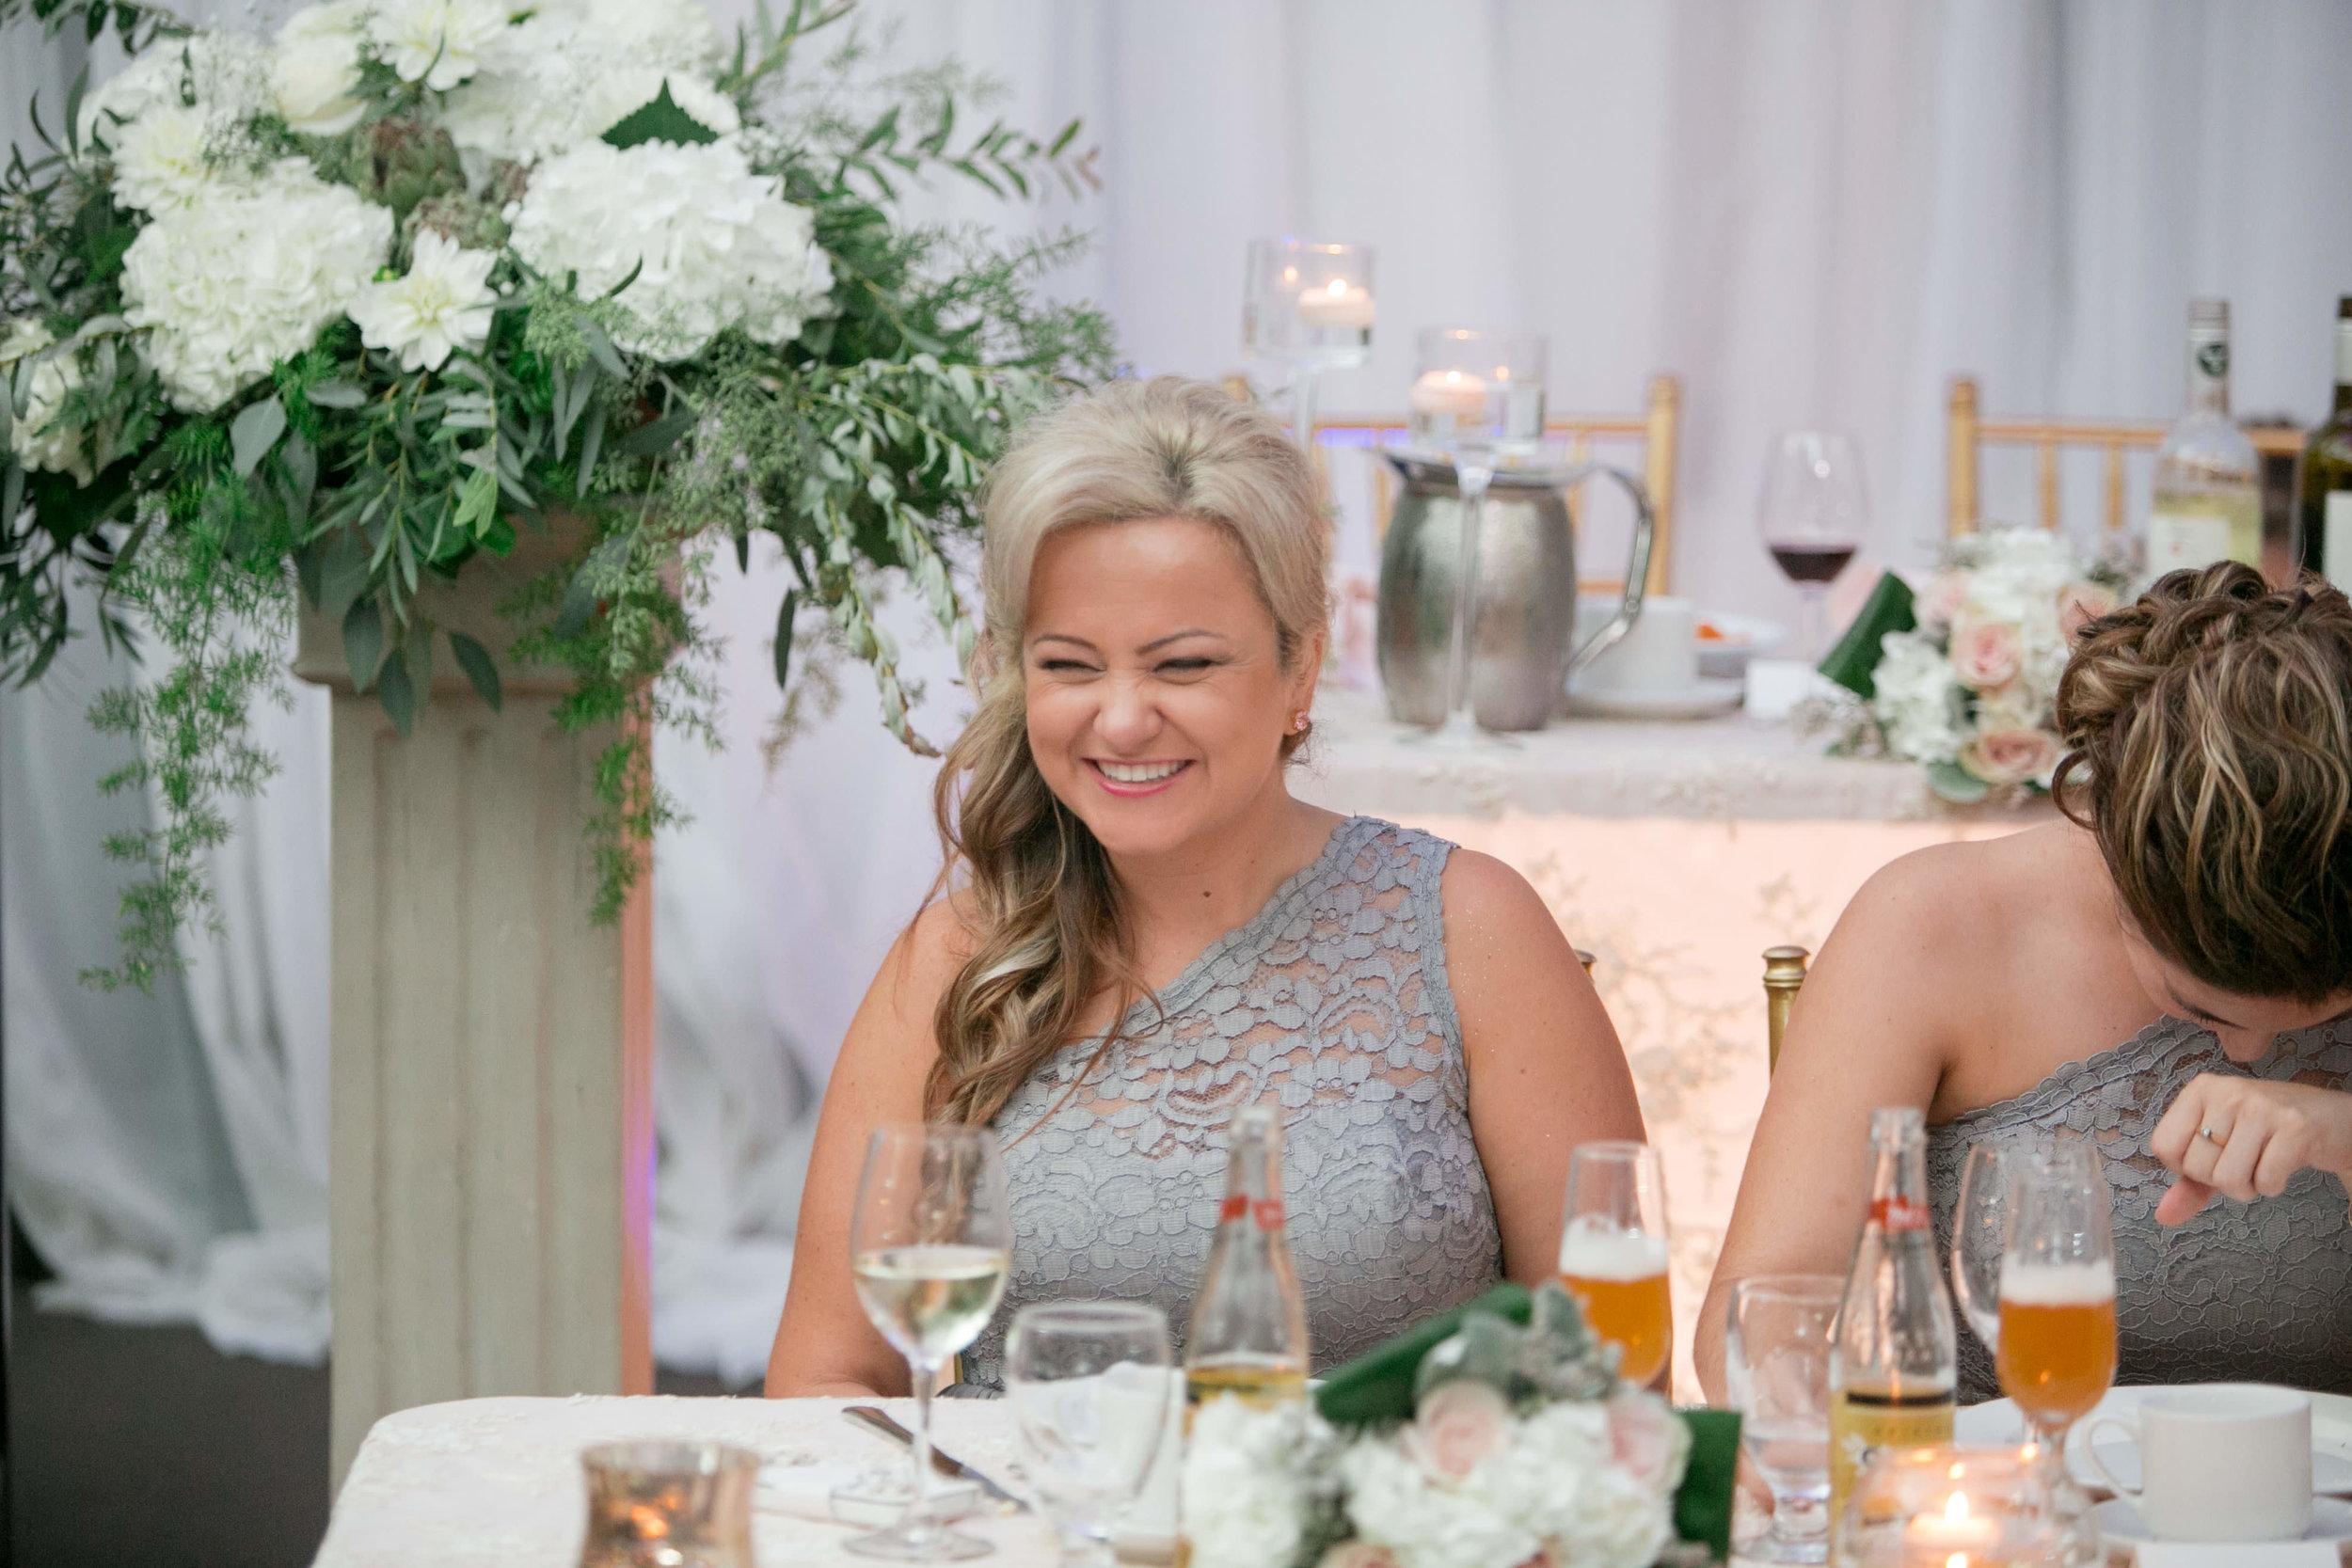 Stefanie___Bernard___Daniel_Ricci_Weddings_High_Res._Finals__570.jpg